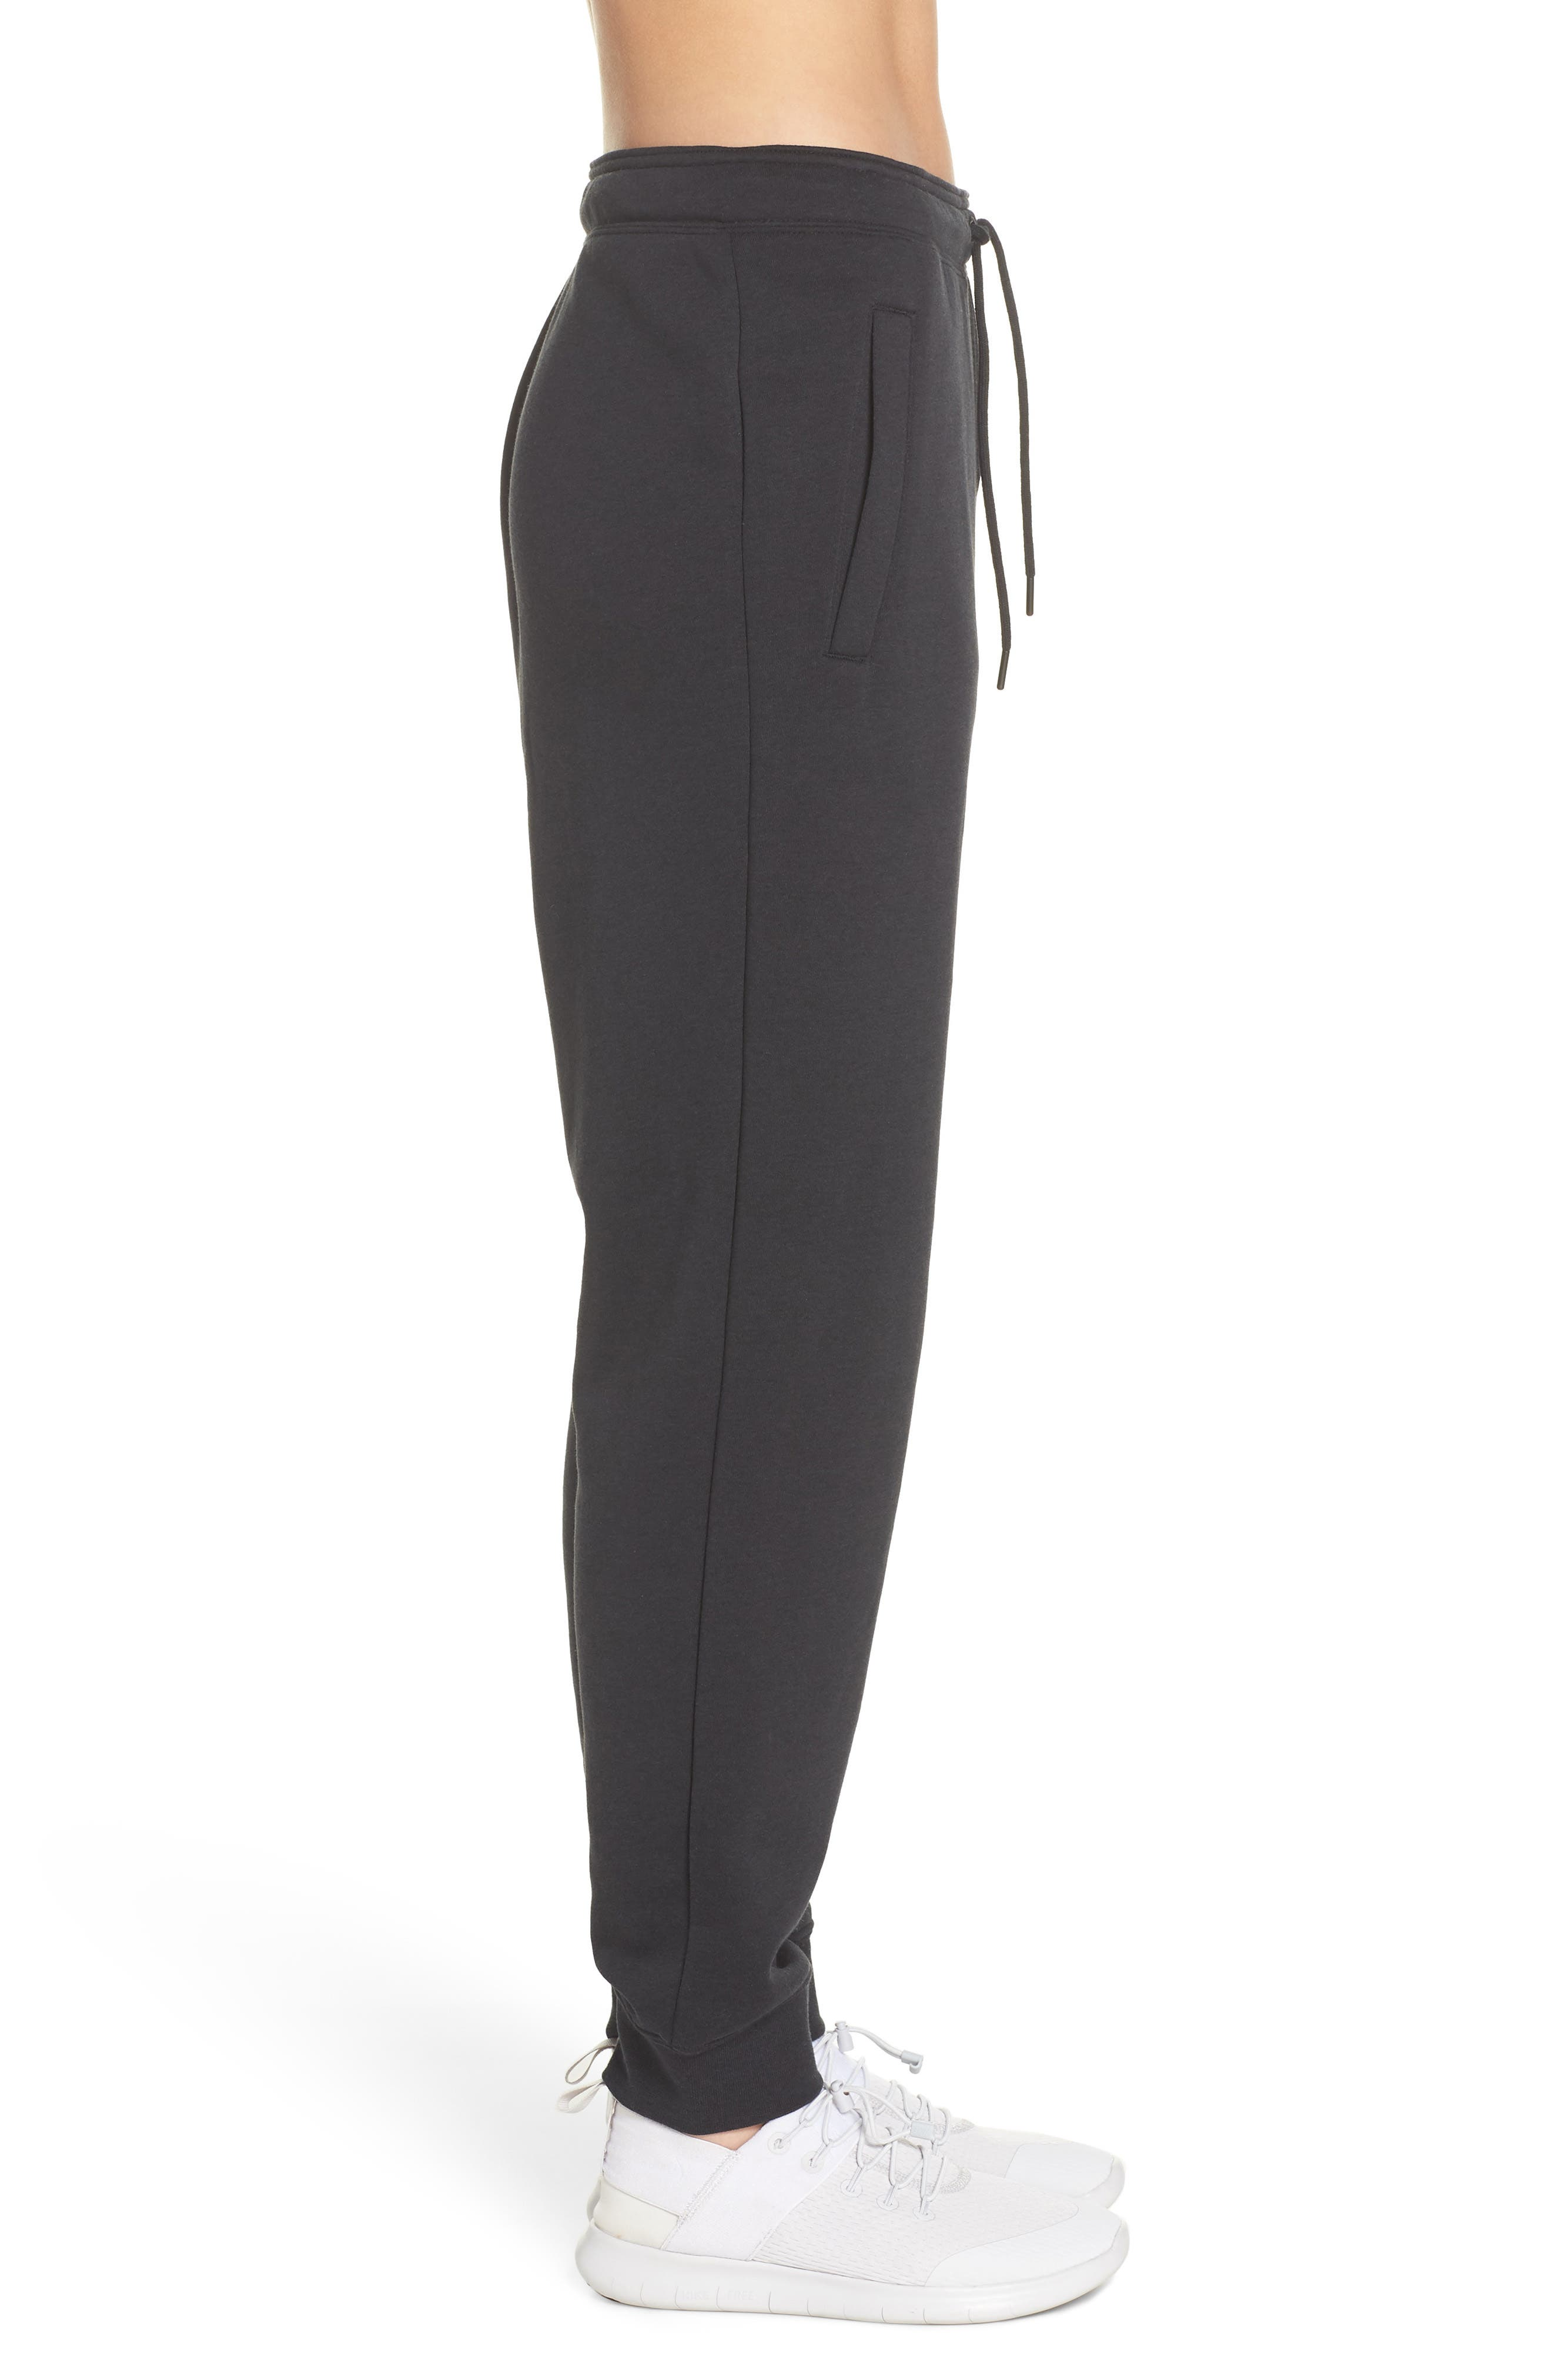 Sportswear Rally Jogger Pants,                             Alternate thumbnail 3, color,                             BLACK/ BLACK/ WHITE